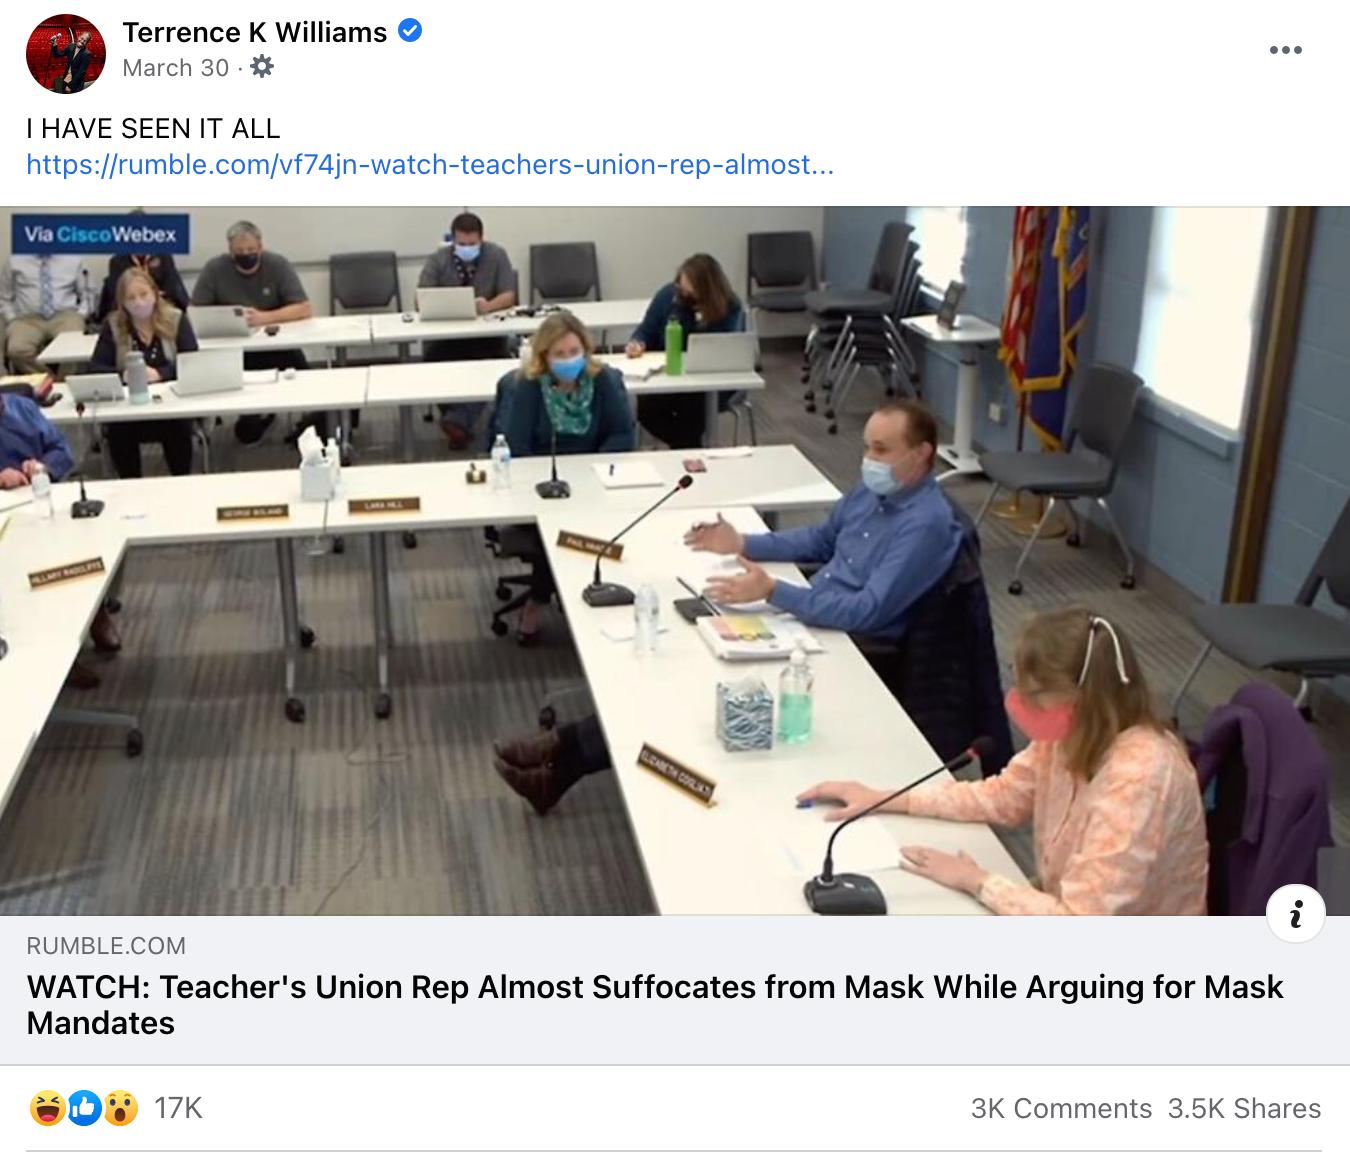 Terrence K Williams_facebook post_20210330